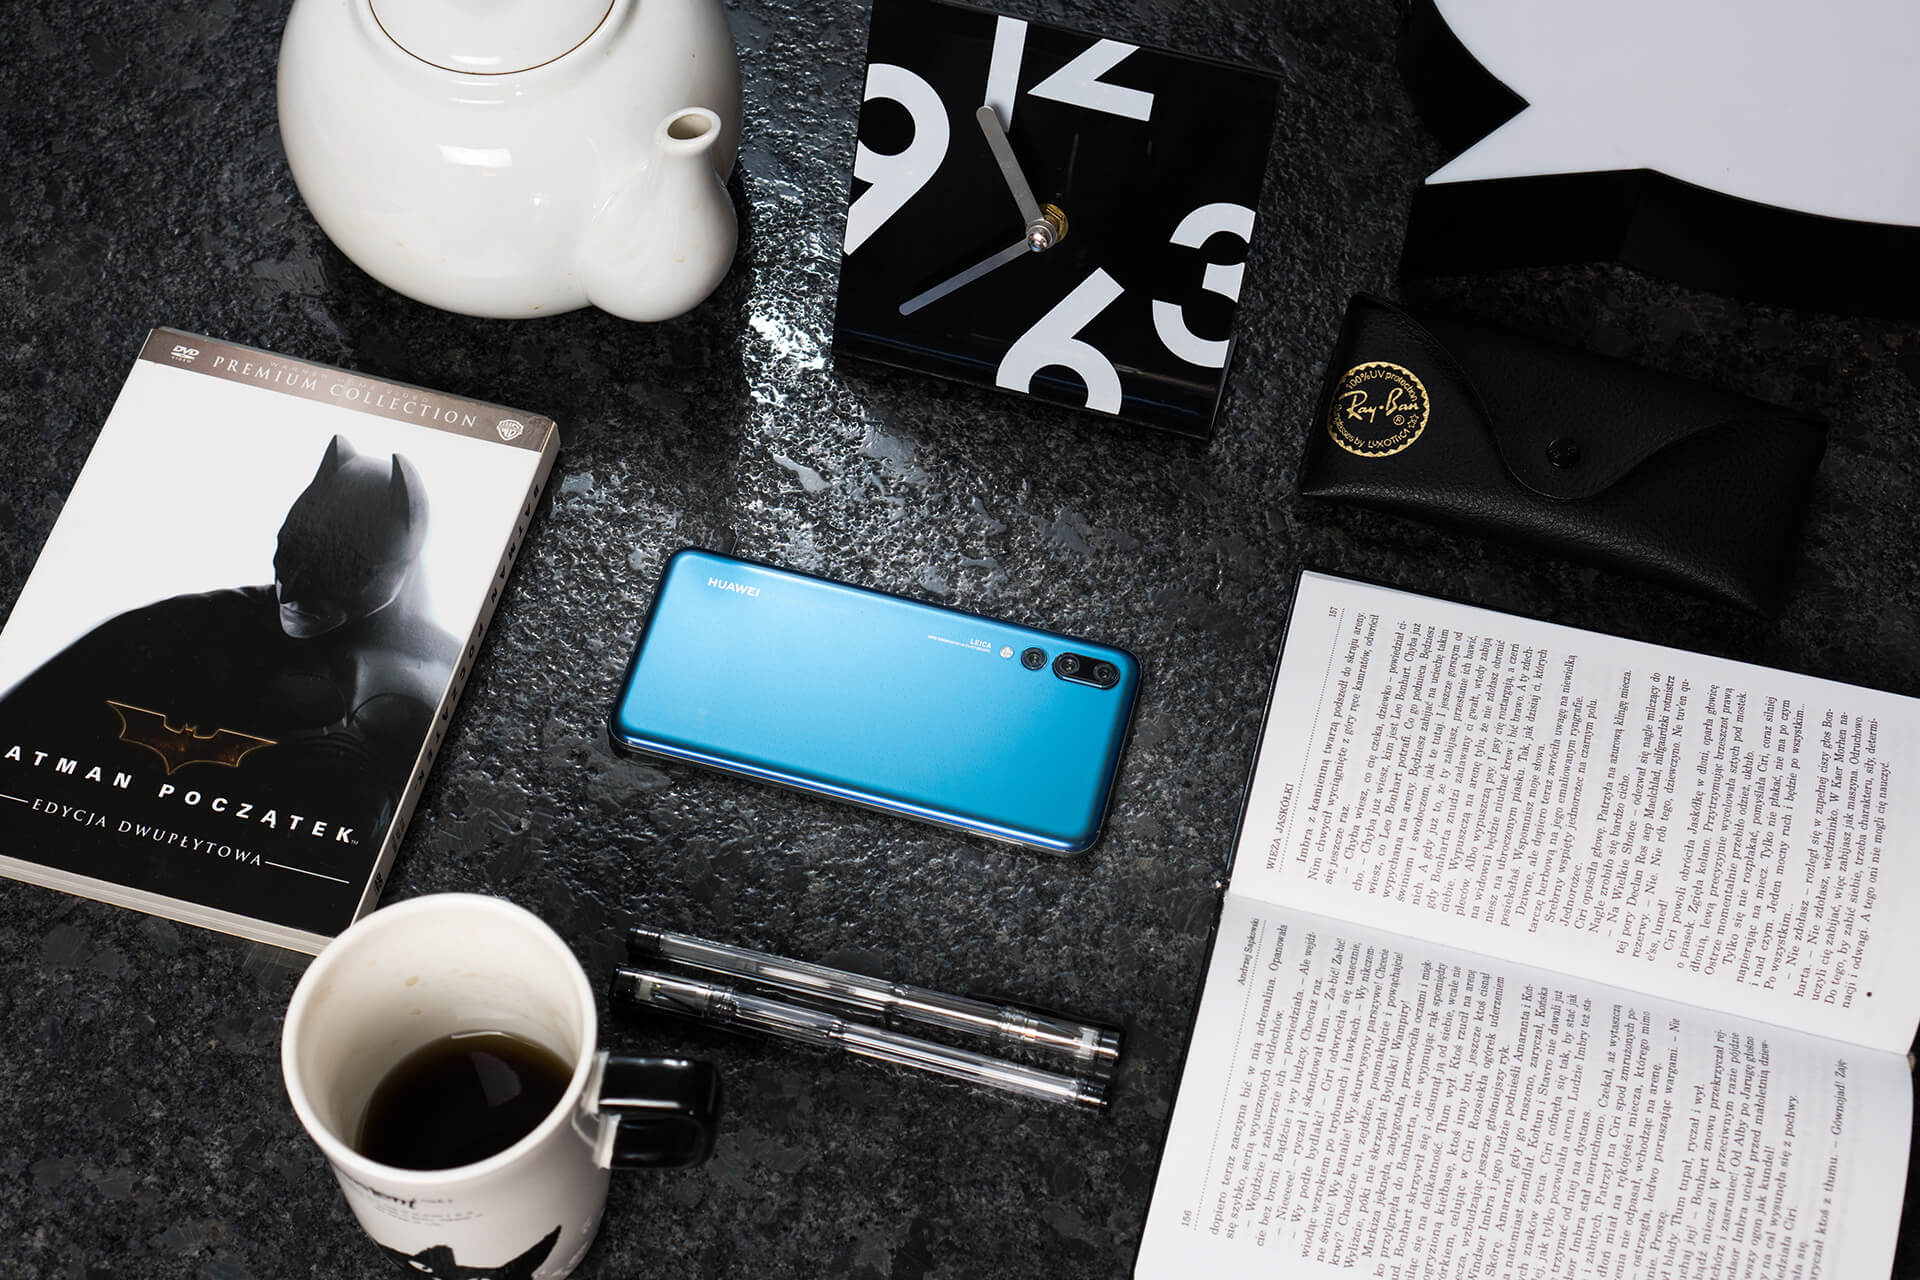 Jaki smartfon do 2500 zł? Huawei P20 Pro